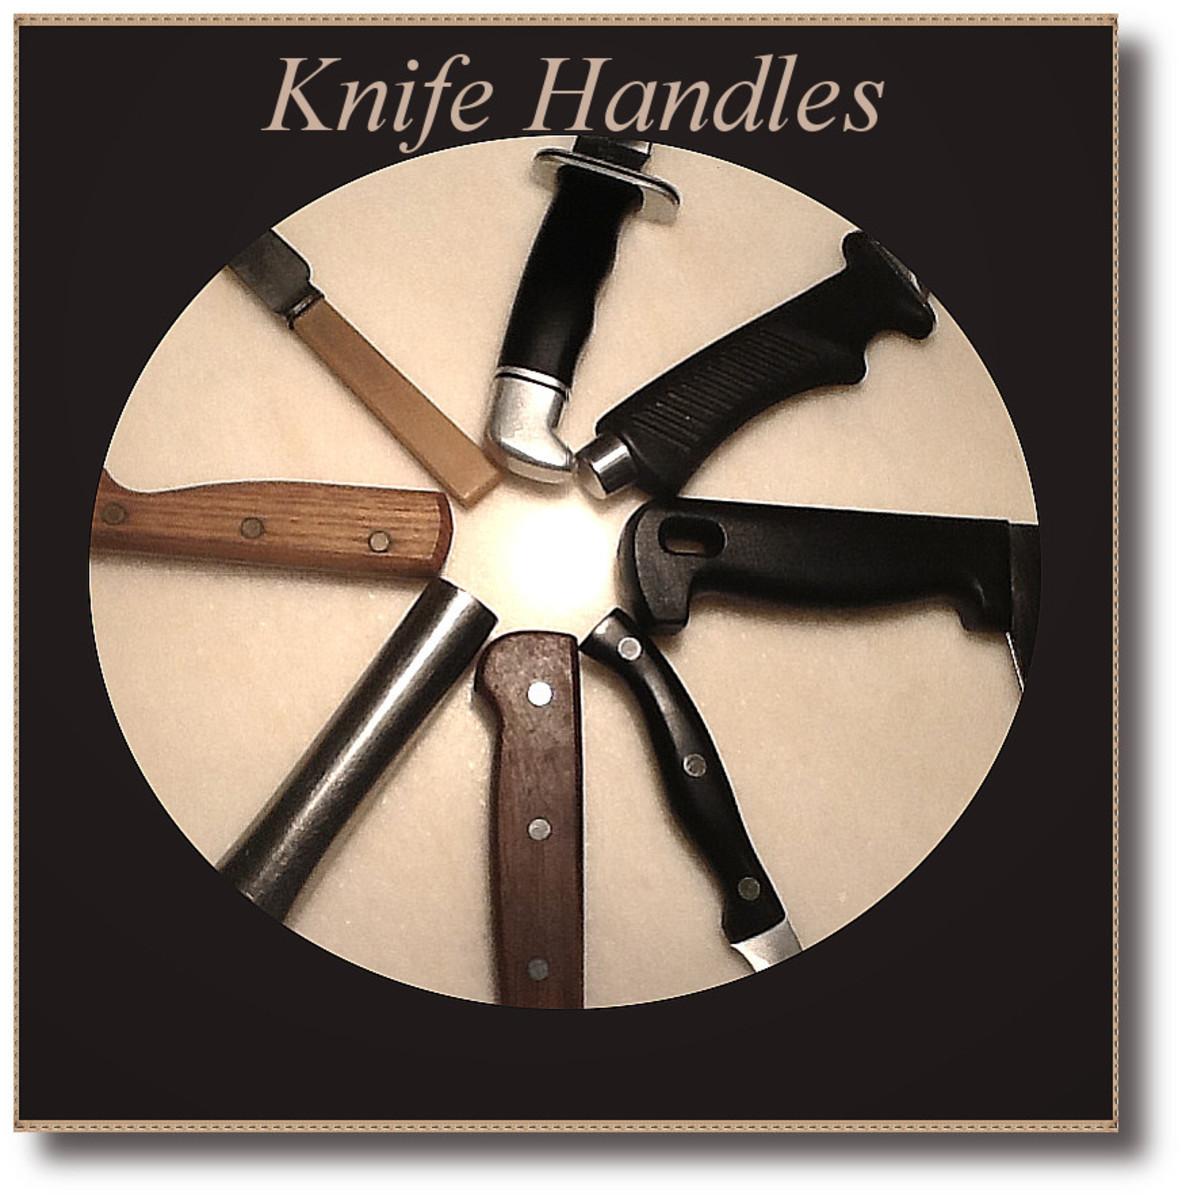 Knife Handles